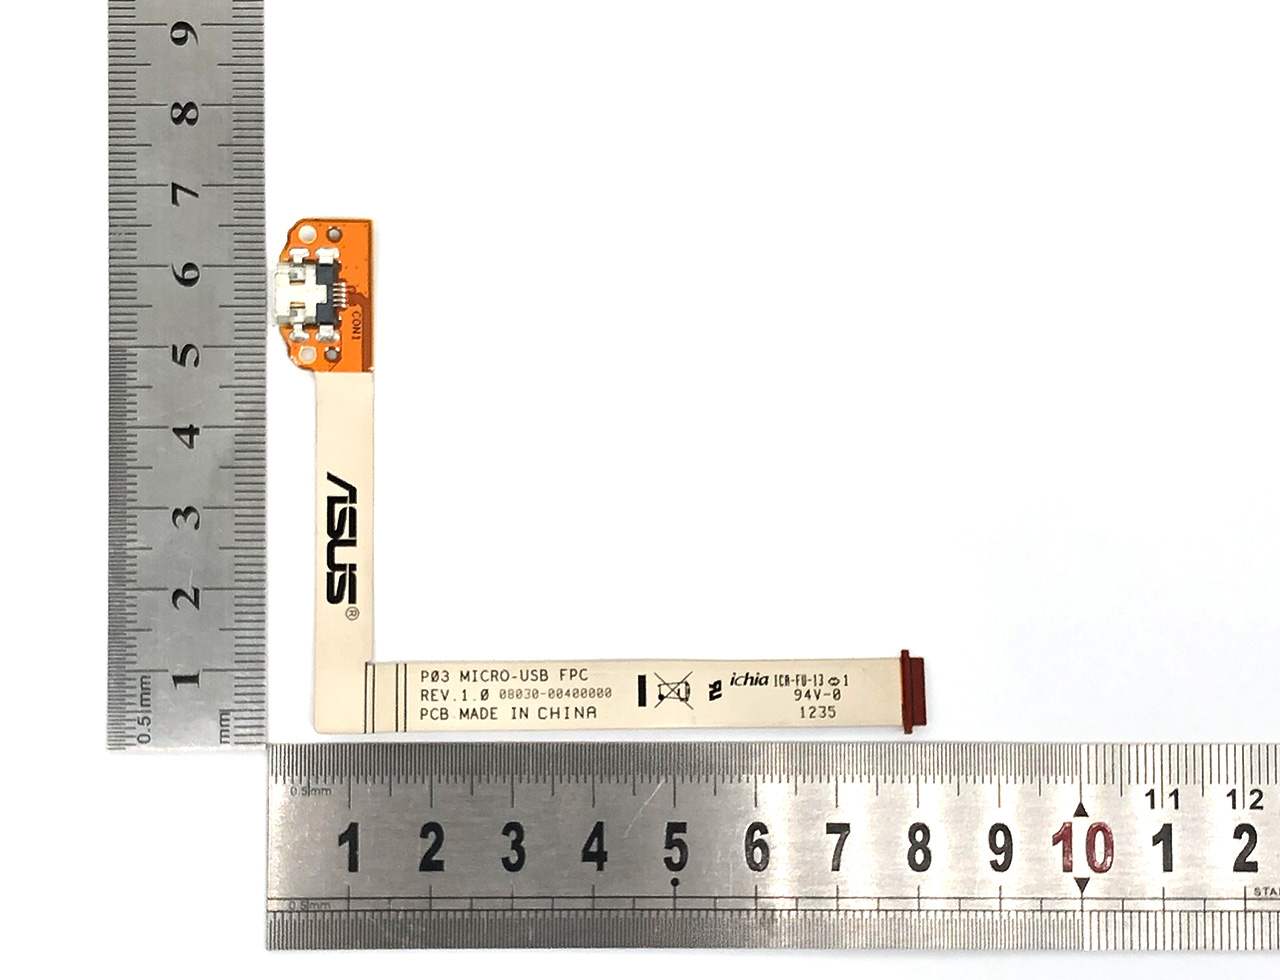 华硕充电排线接头ASUS P03 Micro-USB FPC REV 1.0 0830-00400000 Padfone 2 Station P03 A68 Micro USB尾插电源接口 数据传输排线